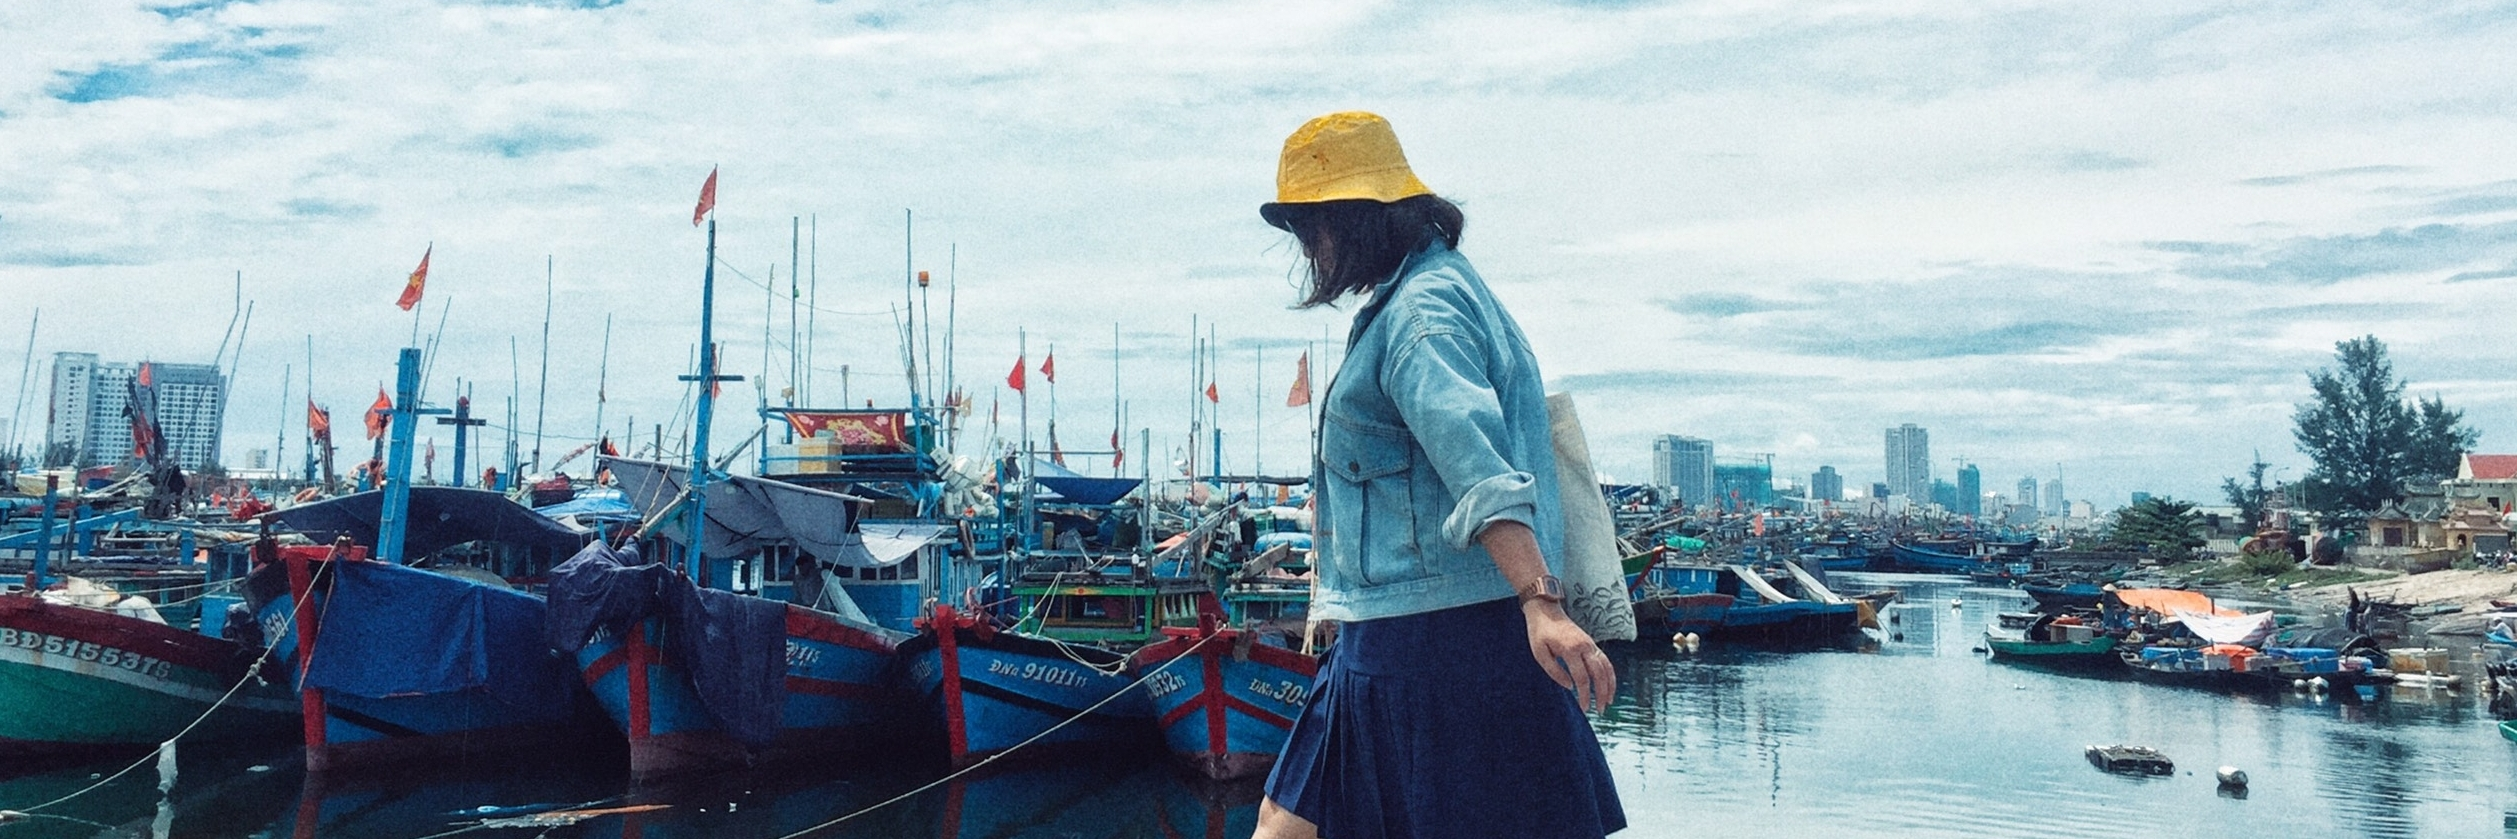 https://gody.vn/blog/hongminh92942120/post/review-lich-trinh-da-nang-hoi-an-hue-trong-5-ngay-5448